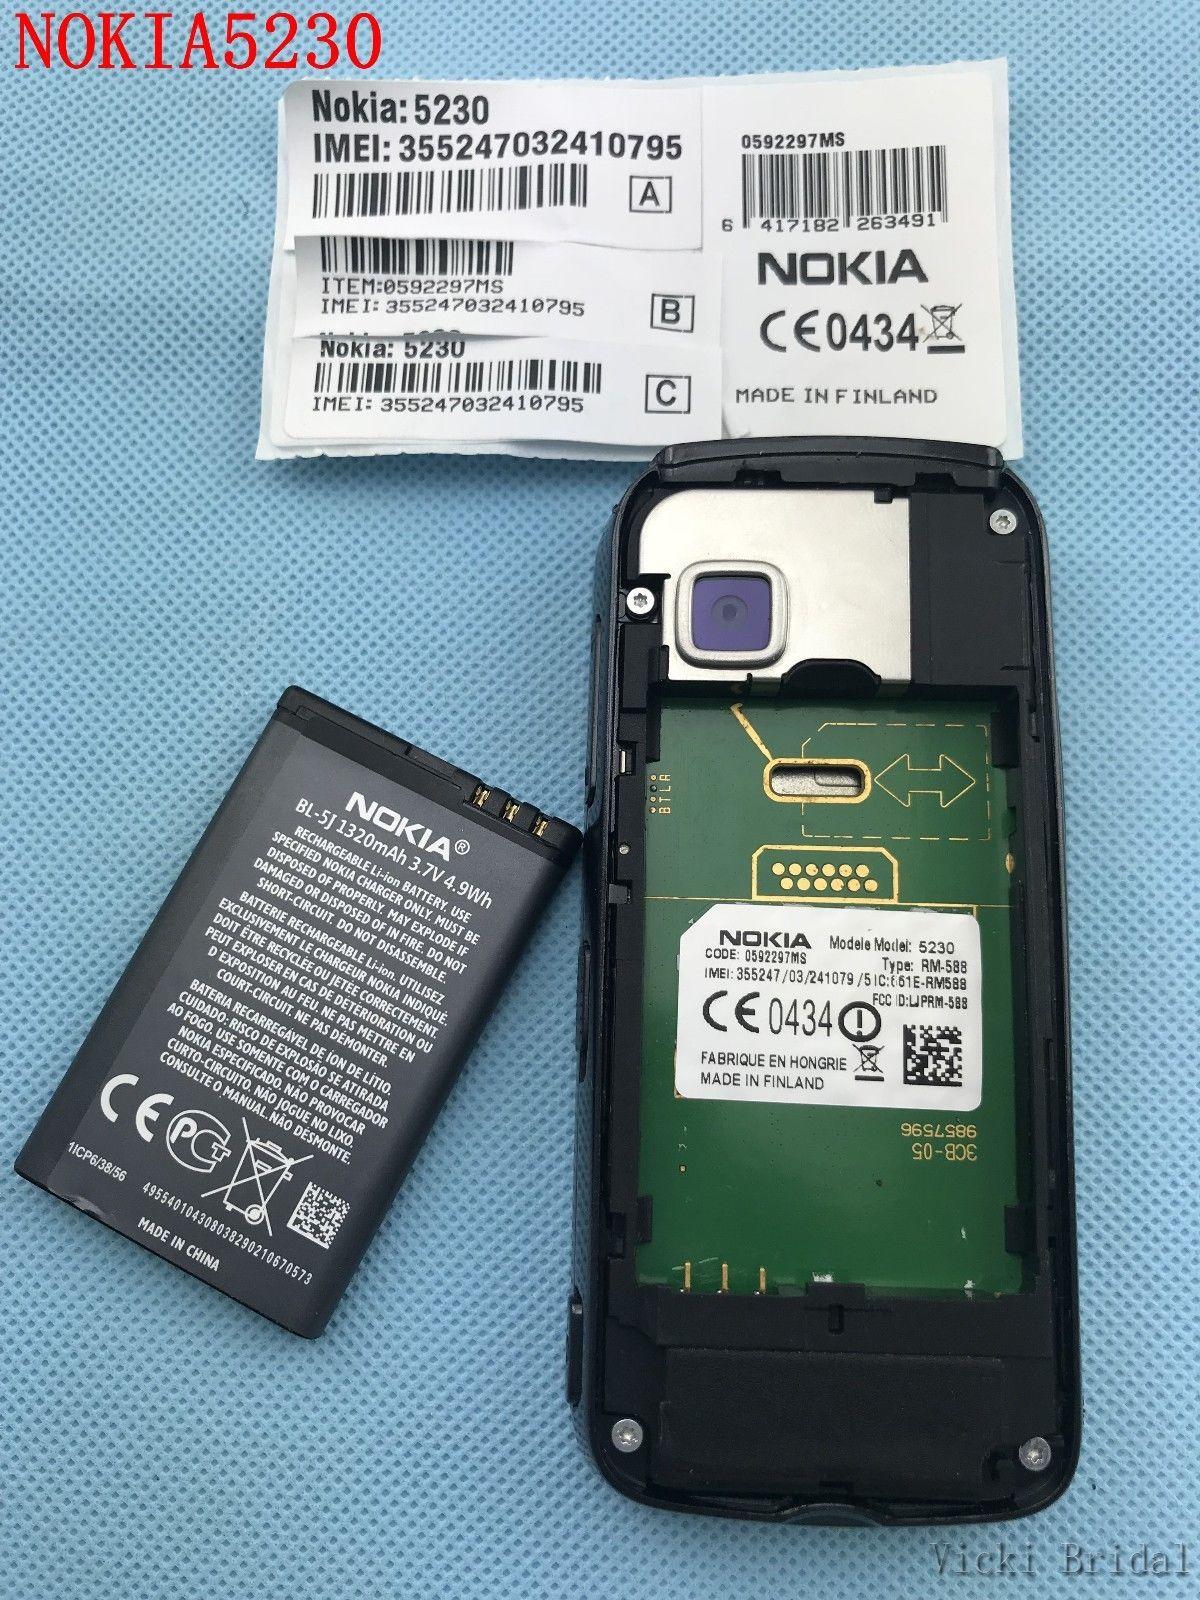 "Refurbished smartphone Nokia 5230 GPS 3G 3.2"" Bluetooth JAVA 2MP Unlocked Mobile Phone white 16"